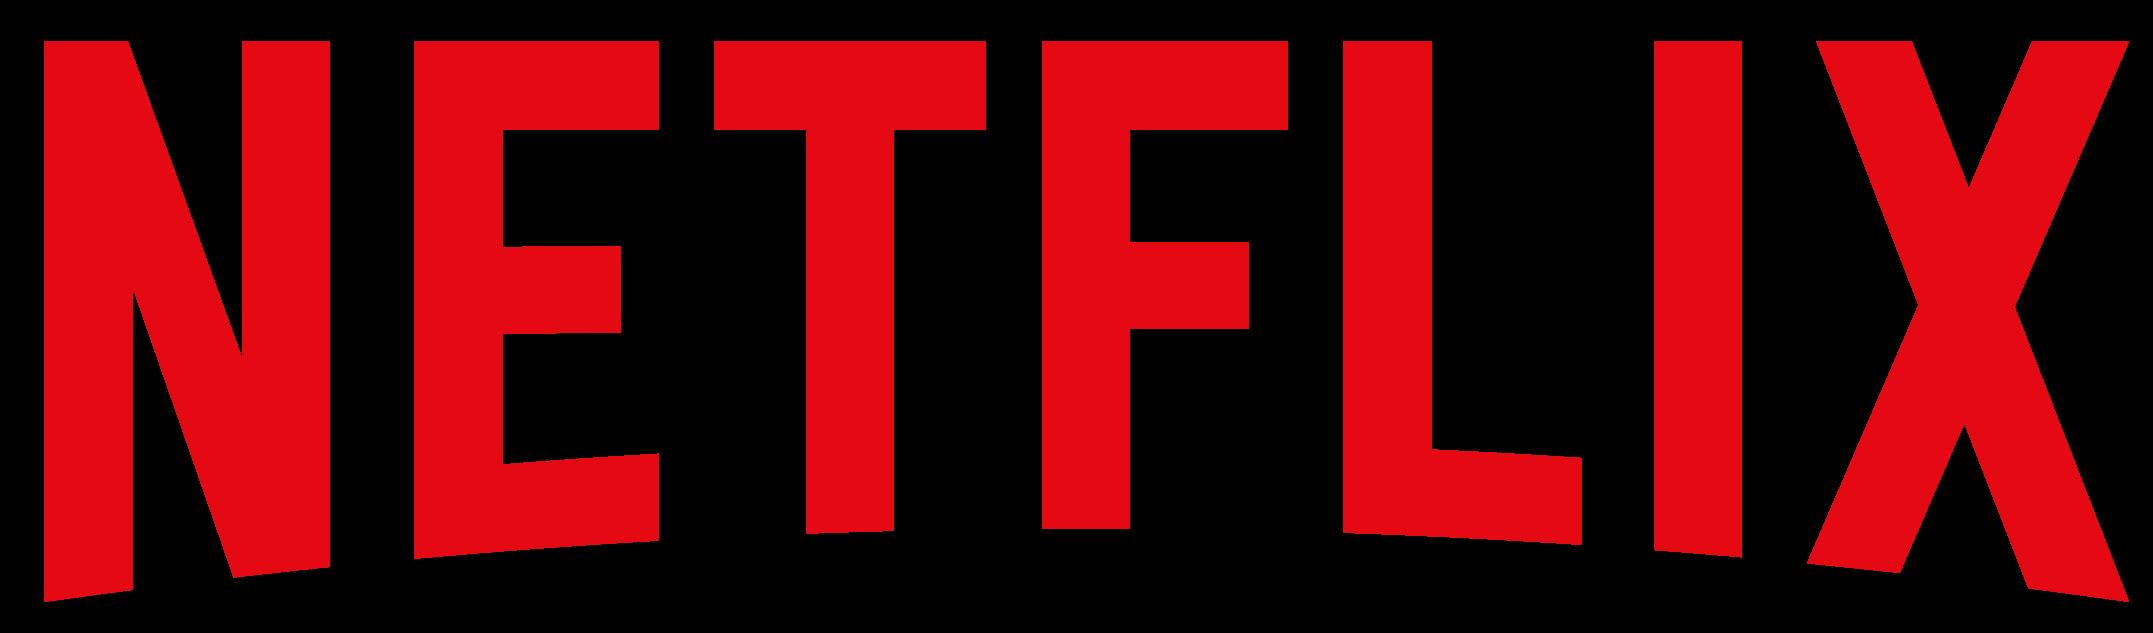 red netflix logo text png 2564 free transparent png logos homesense logo png homesense logo vector